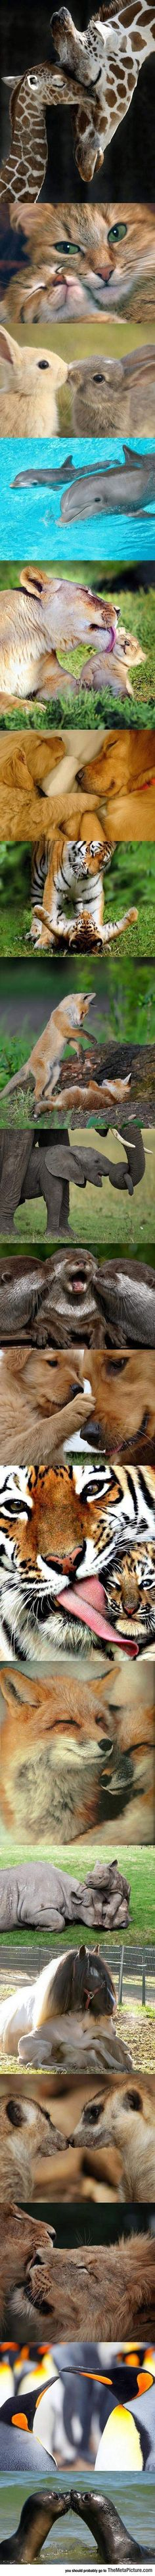 Animal Kingdom Love - The Meta Picture